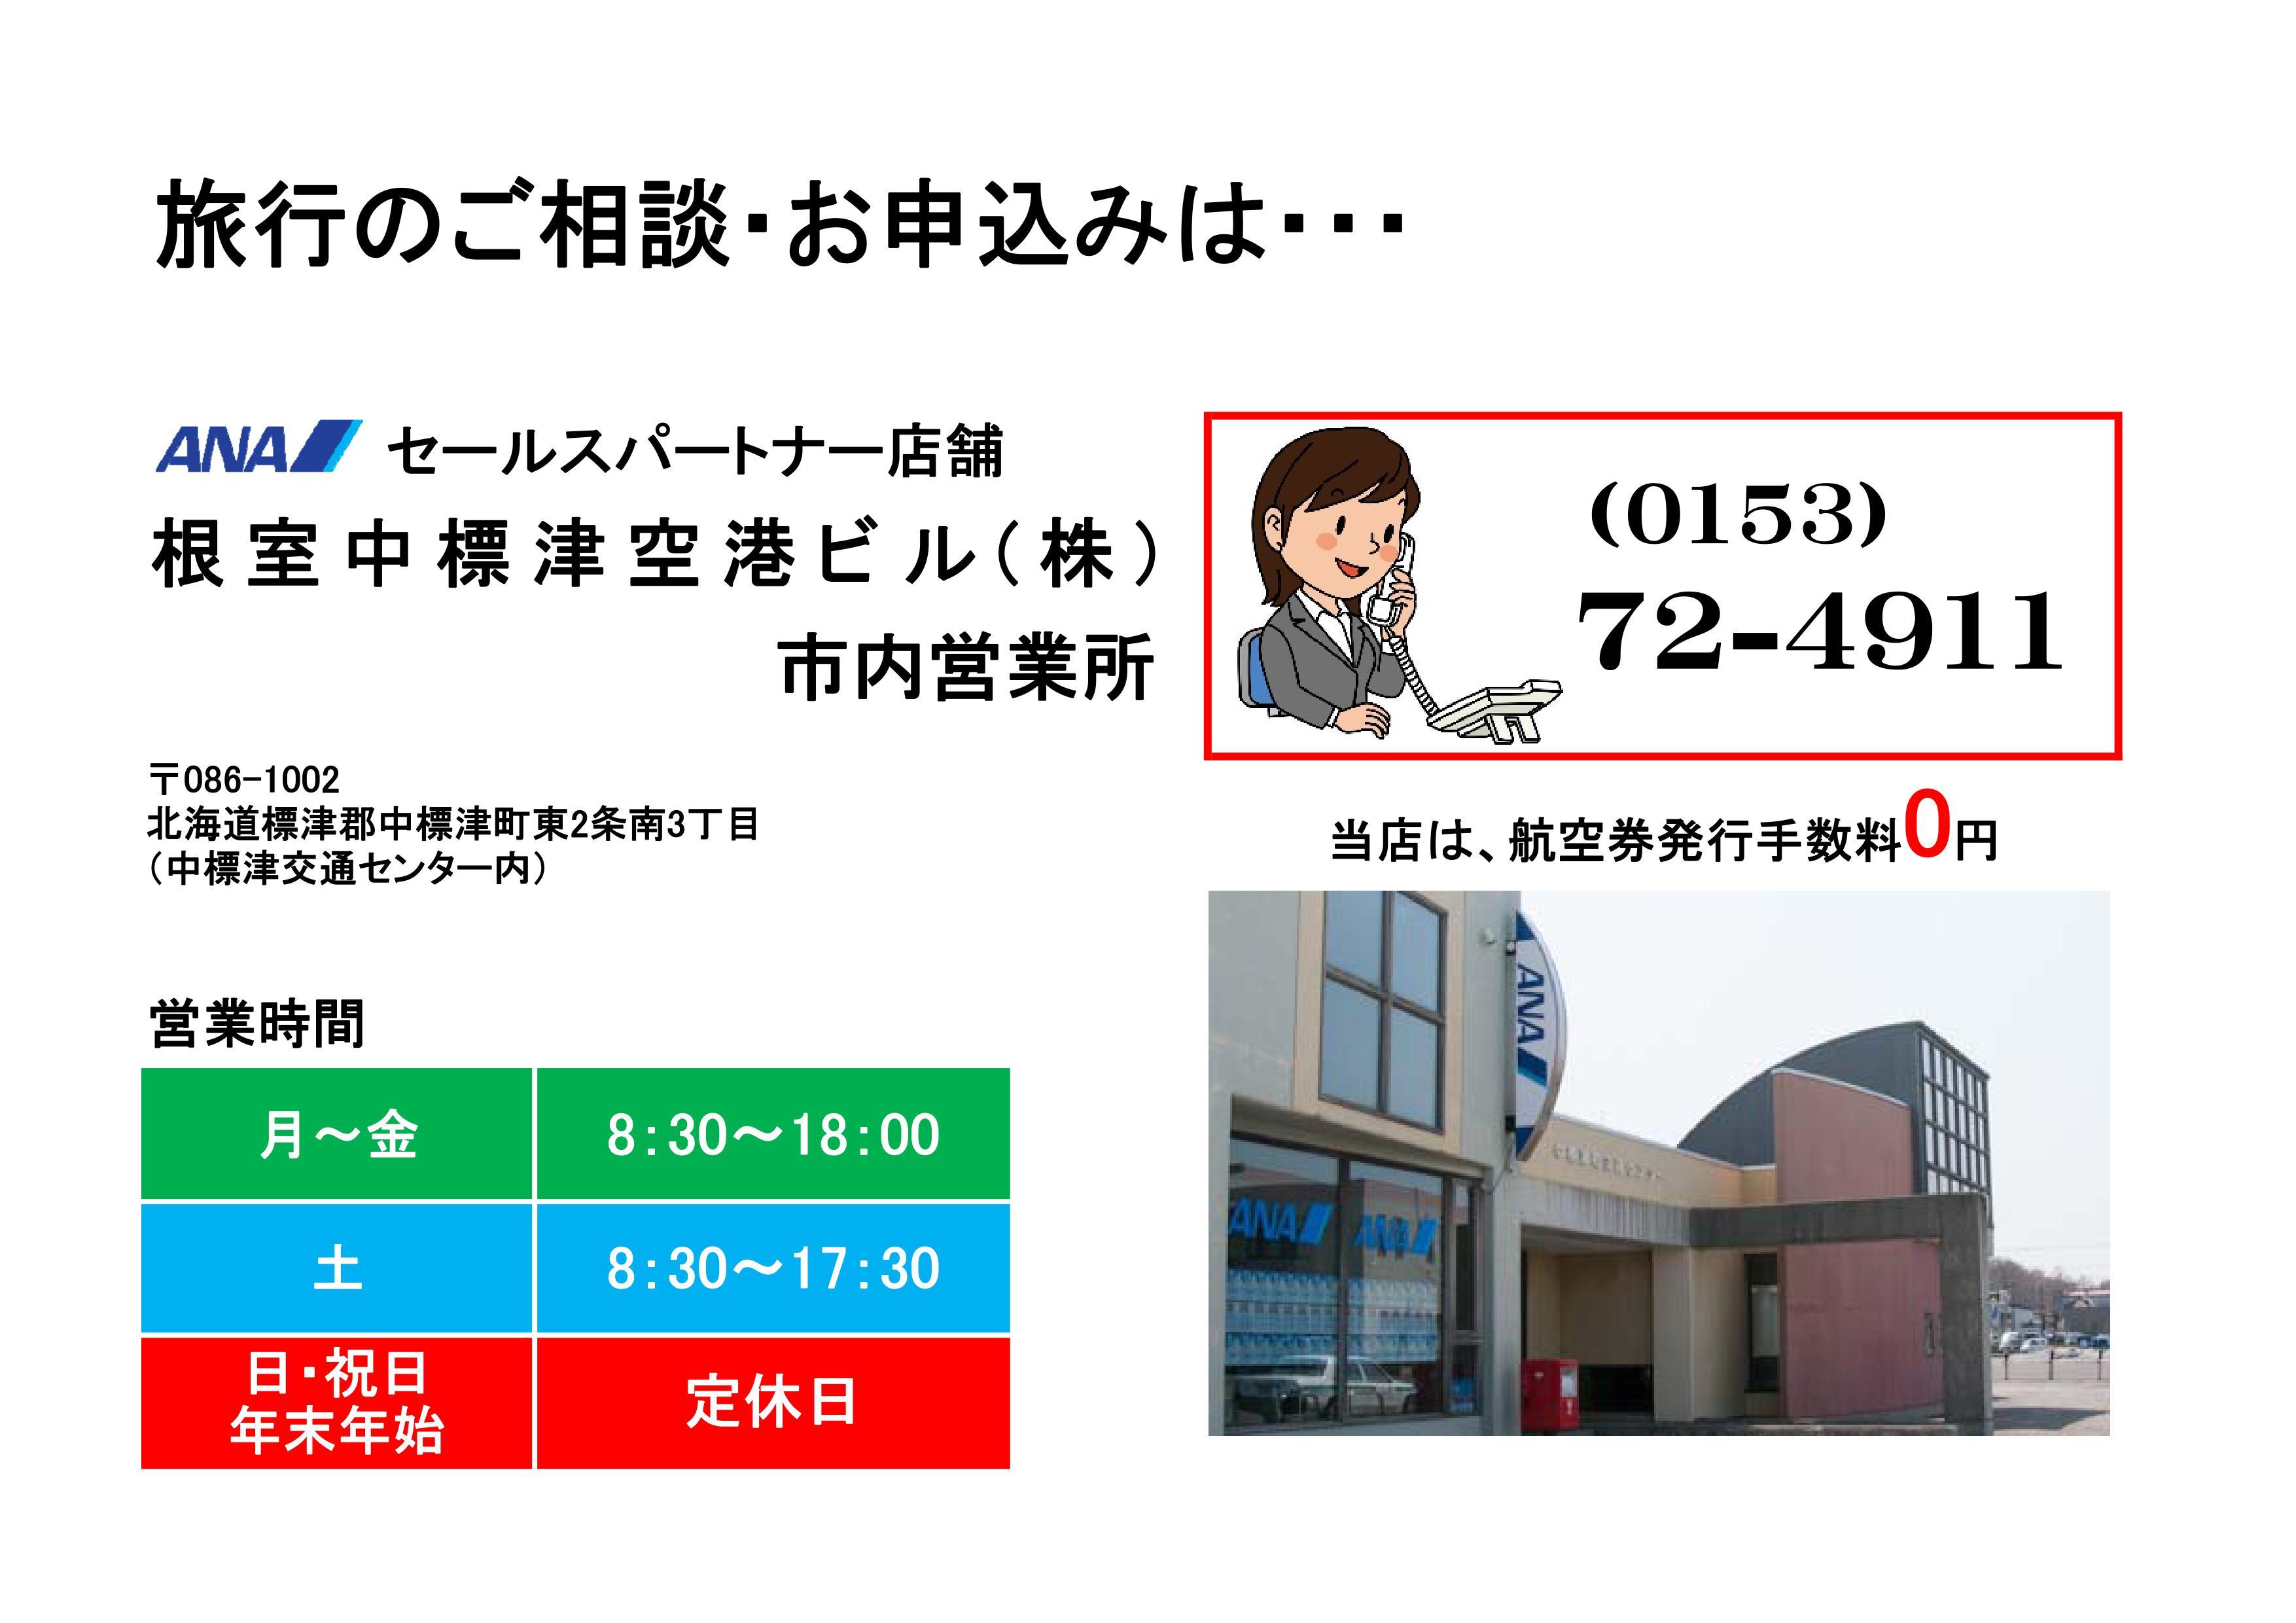 http://www.nakashibetsu-airport.jp/%E5%96%B6%E6%A5%AD%E6%99%82%E9%96%93%E6%8E%B2%E8%BC%89.jpg